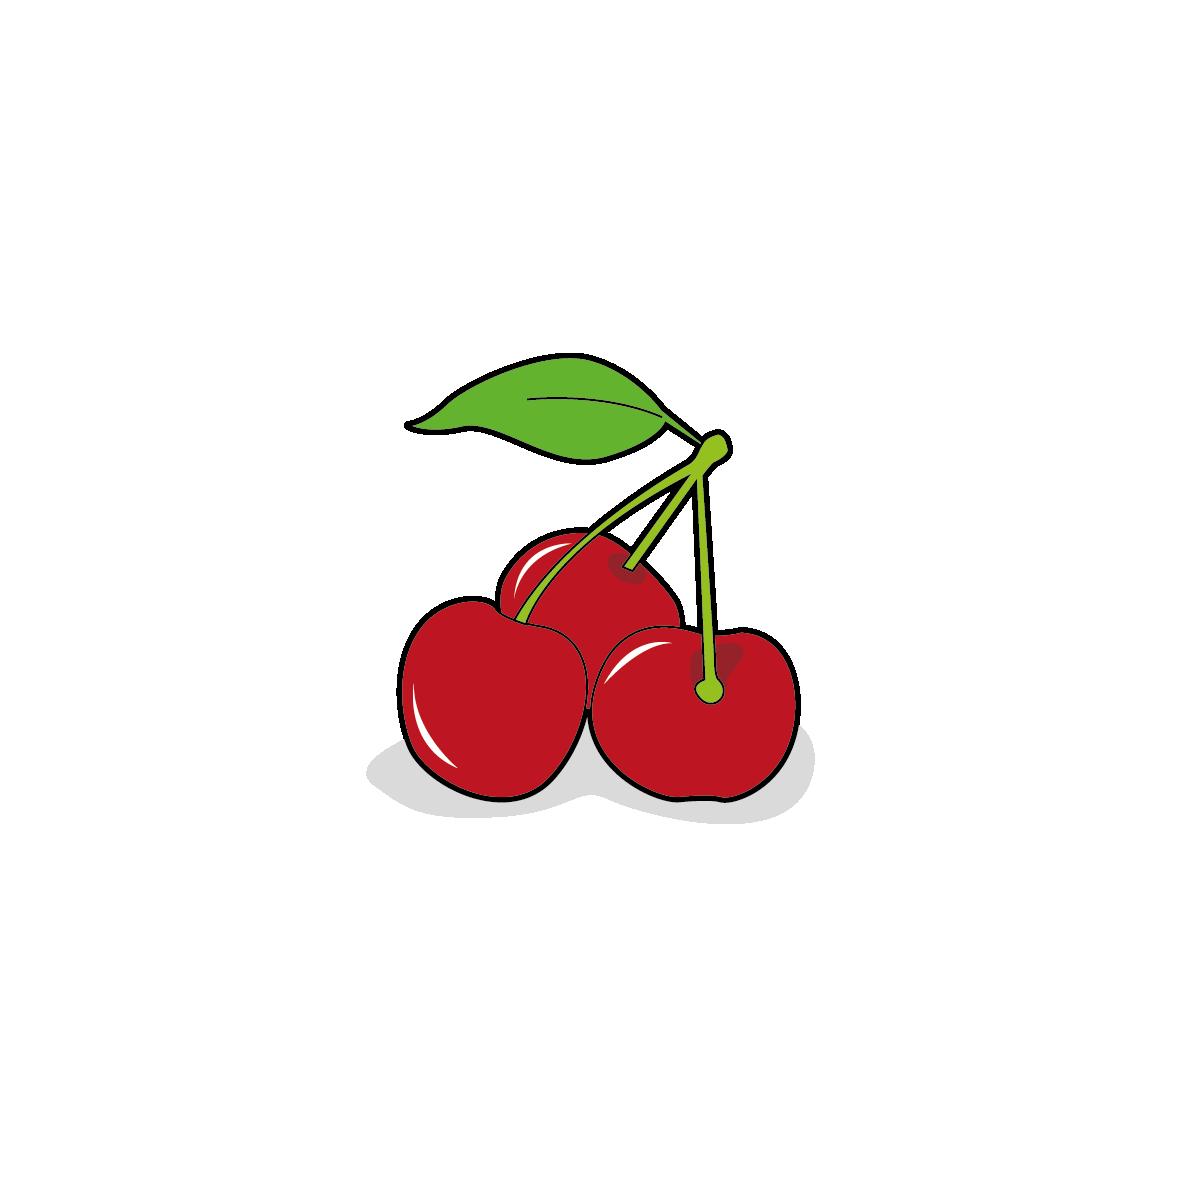 Icone de cerises, ailmacocotte.com